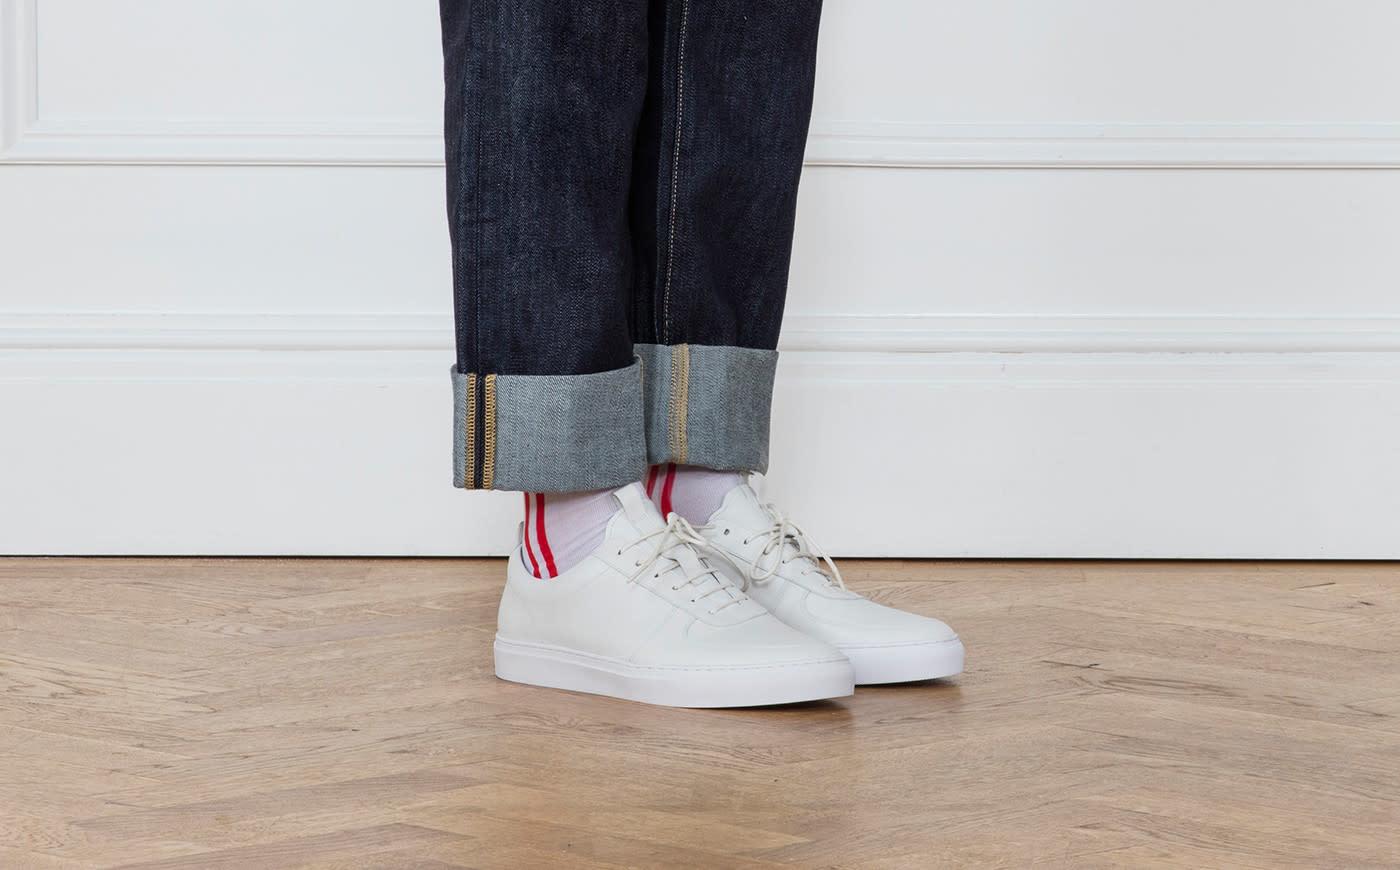 Sneaker 22 White Calf Leather-4